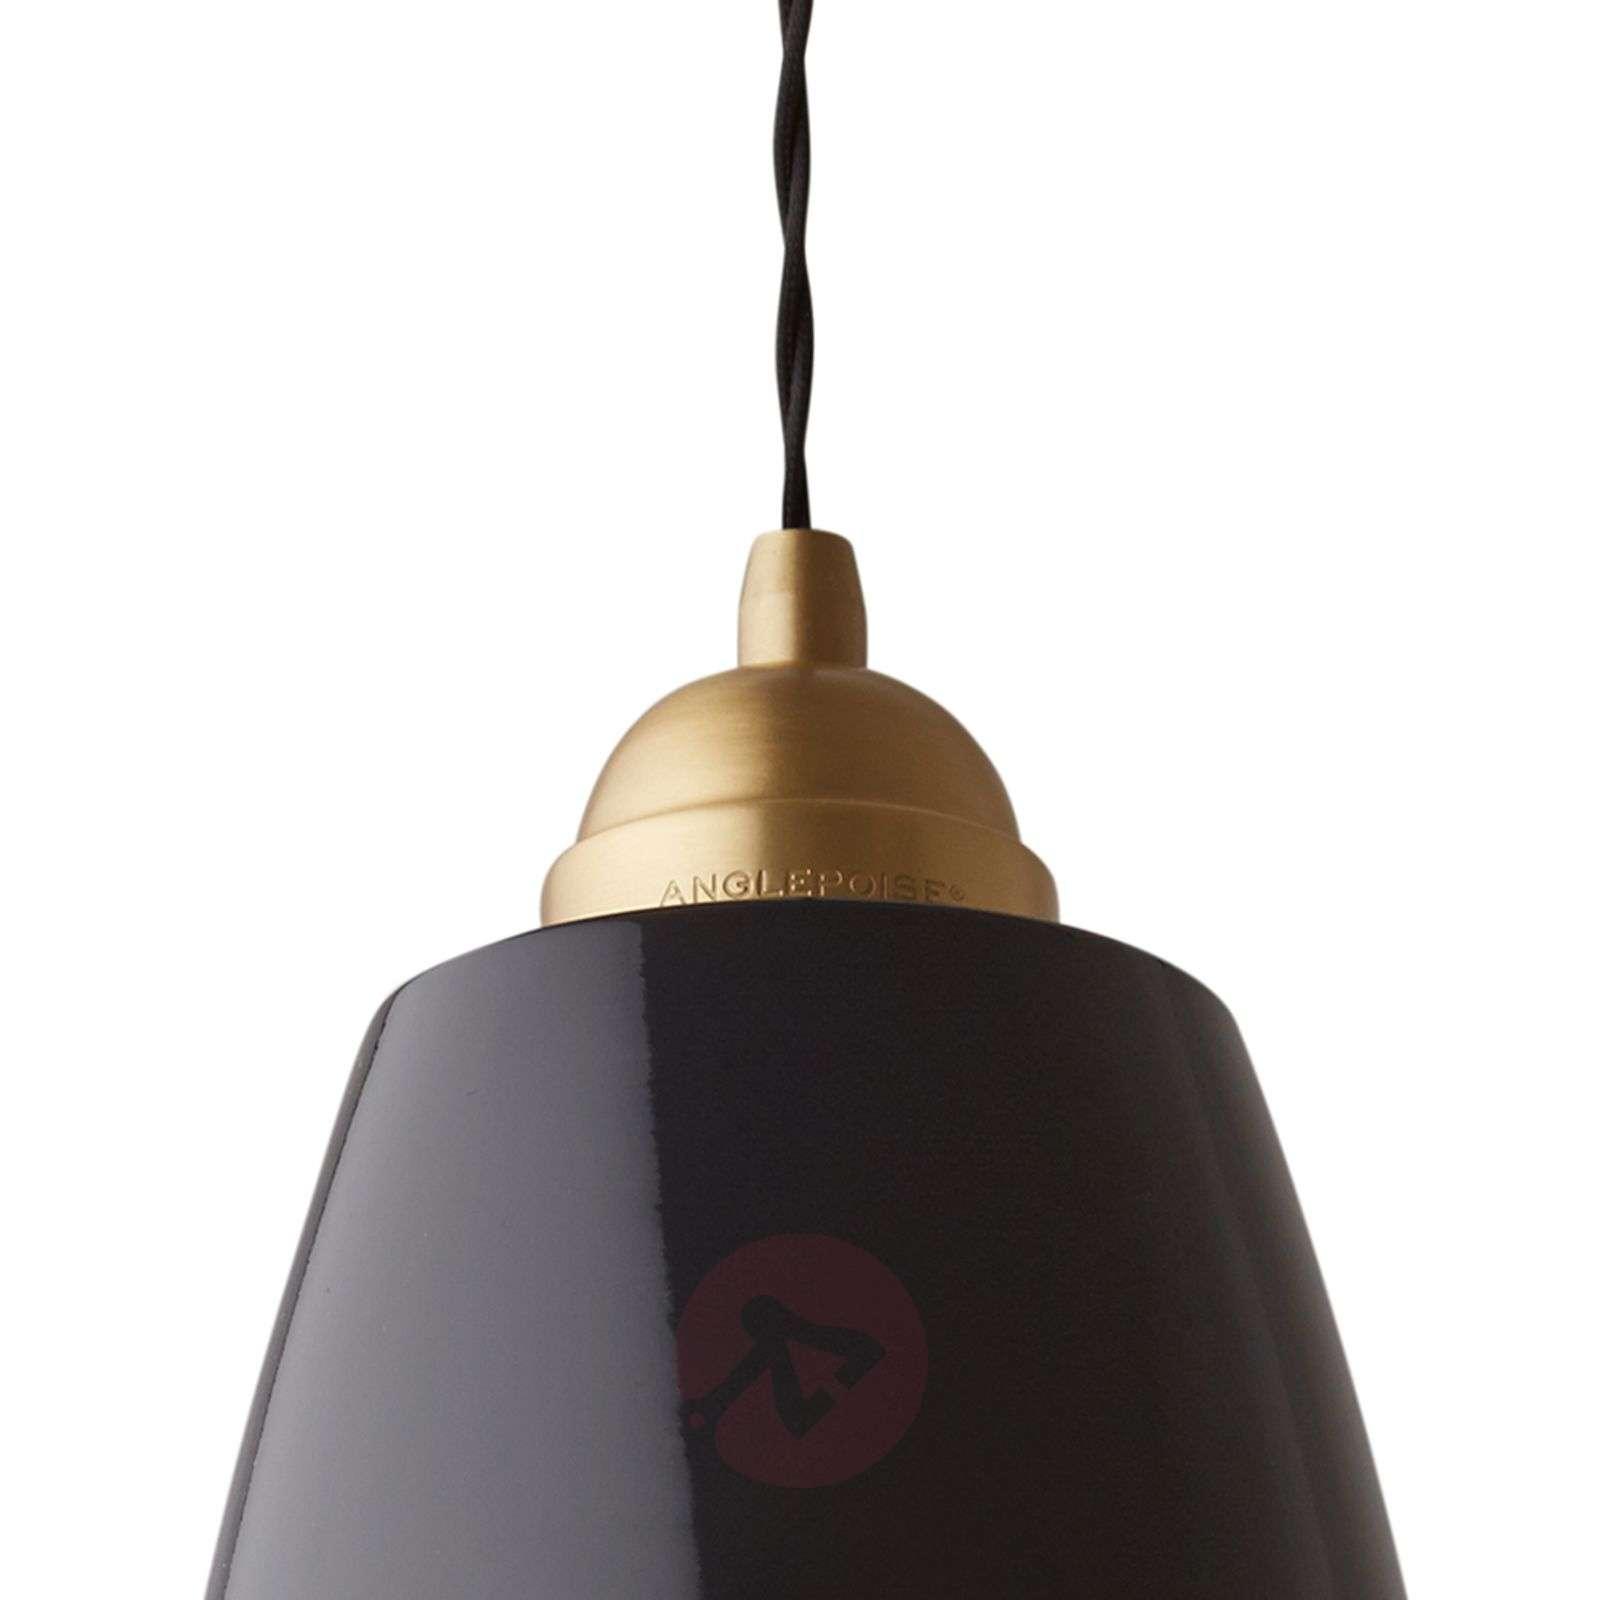 Anglepoise® Original 1227 Maxi brass pendant lamp-1073087X-01